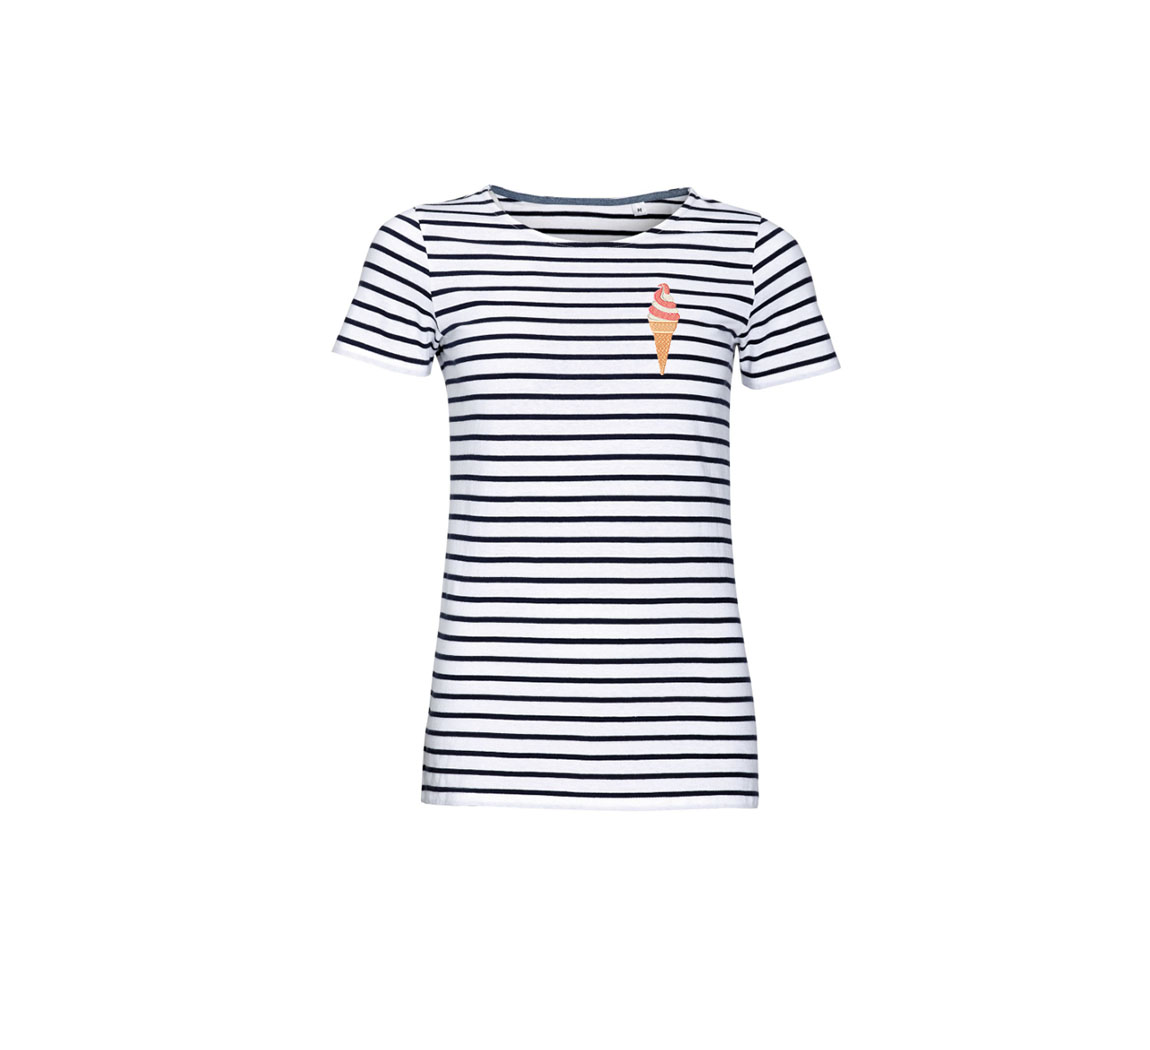 T shirt marinière femme Women's Stripes Tee  Women's Stripes Tee